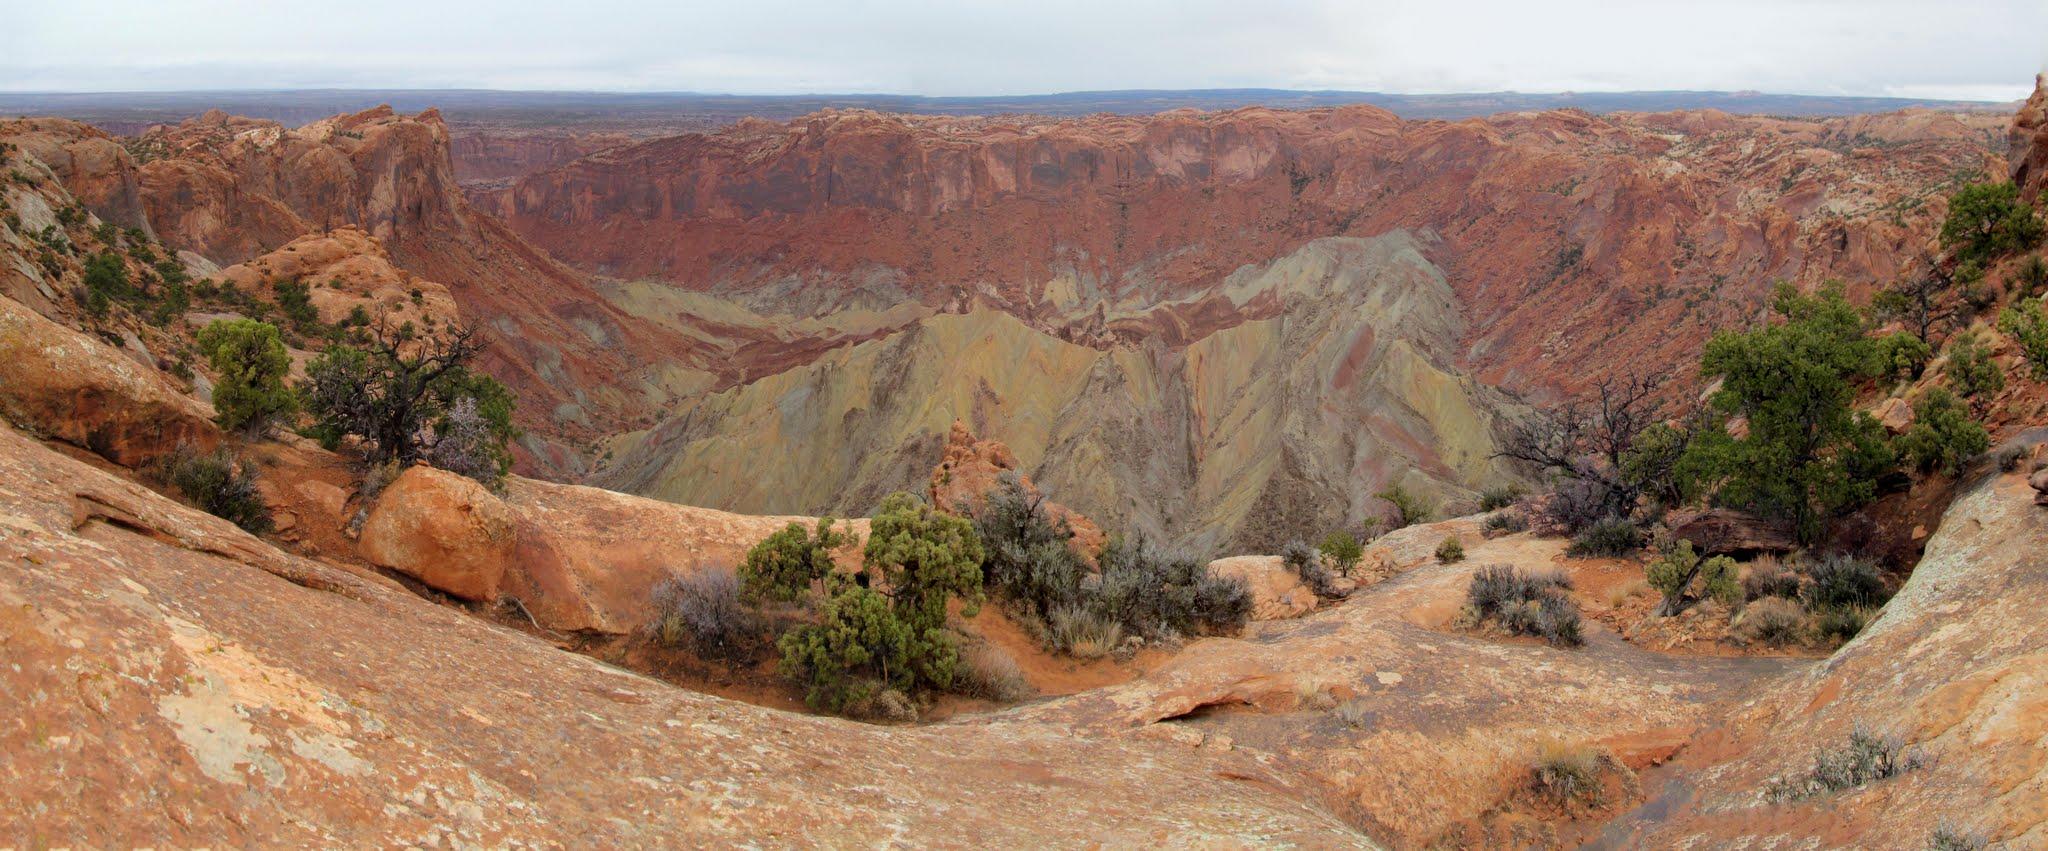 Photo: Upheaval Dome panorama